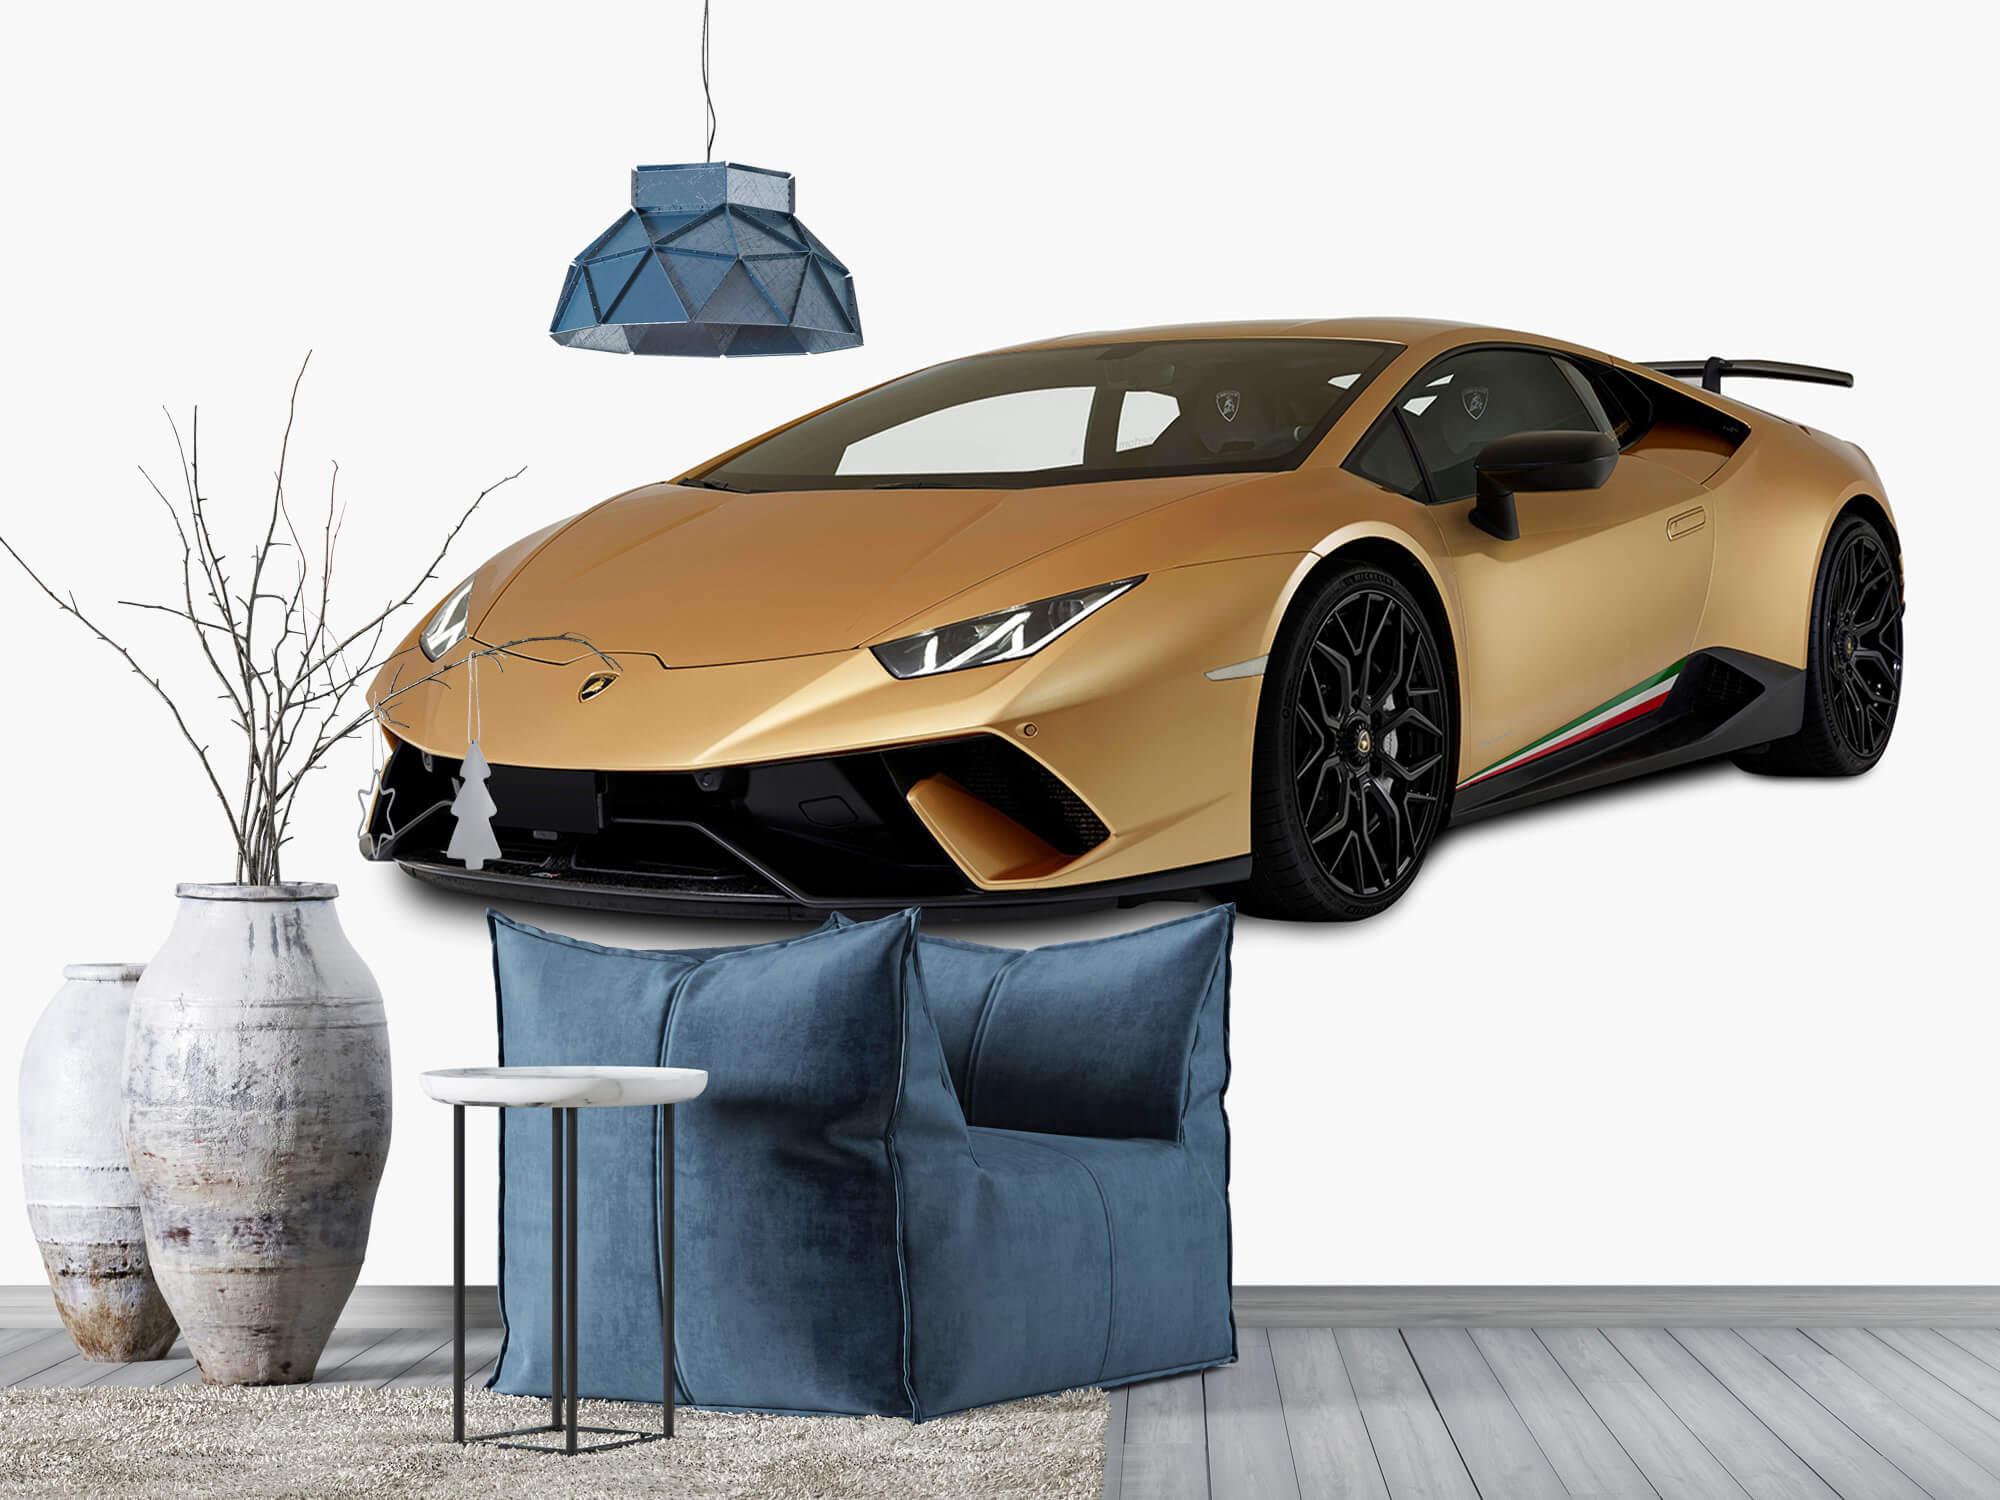 Wallpaper Lamborghini Huracán - Rechter voorkant wit 6